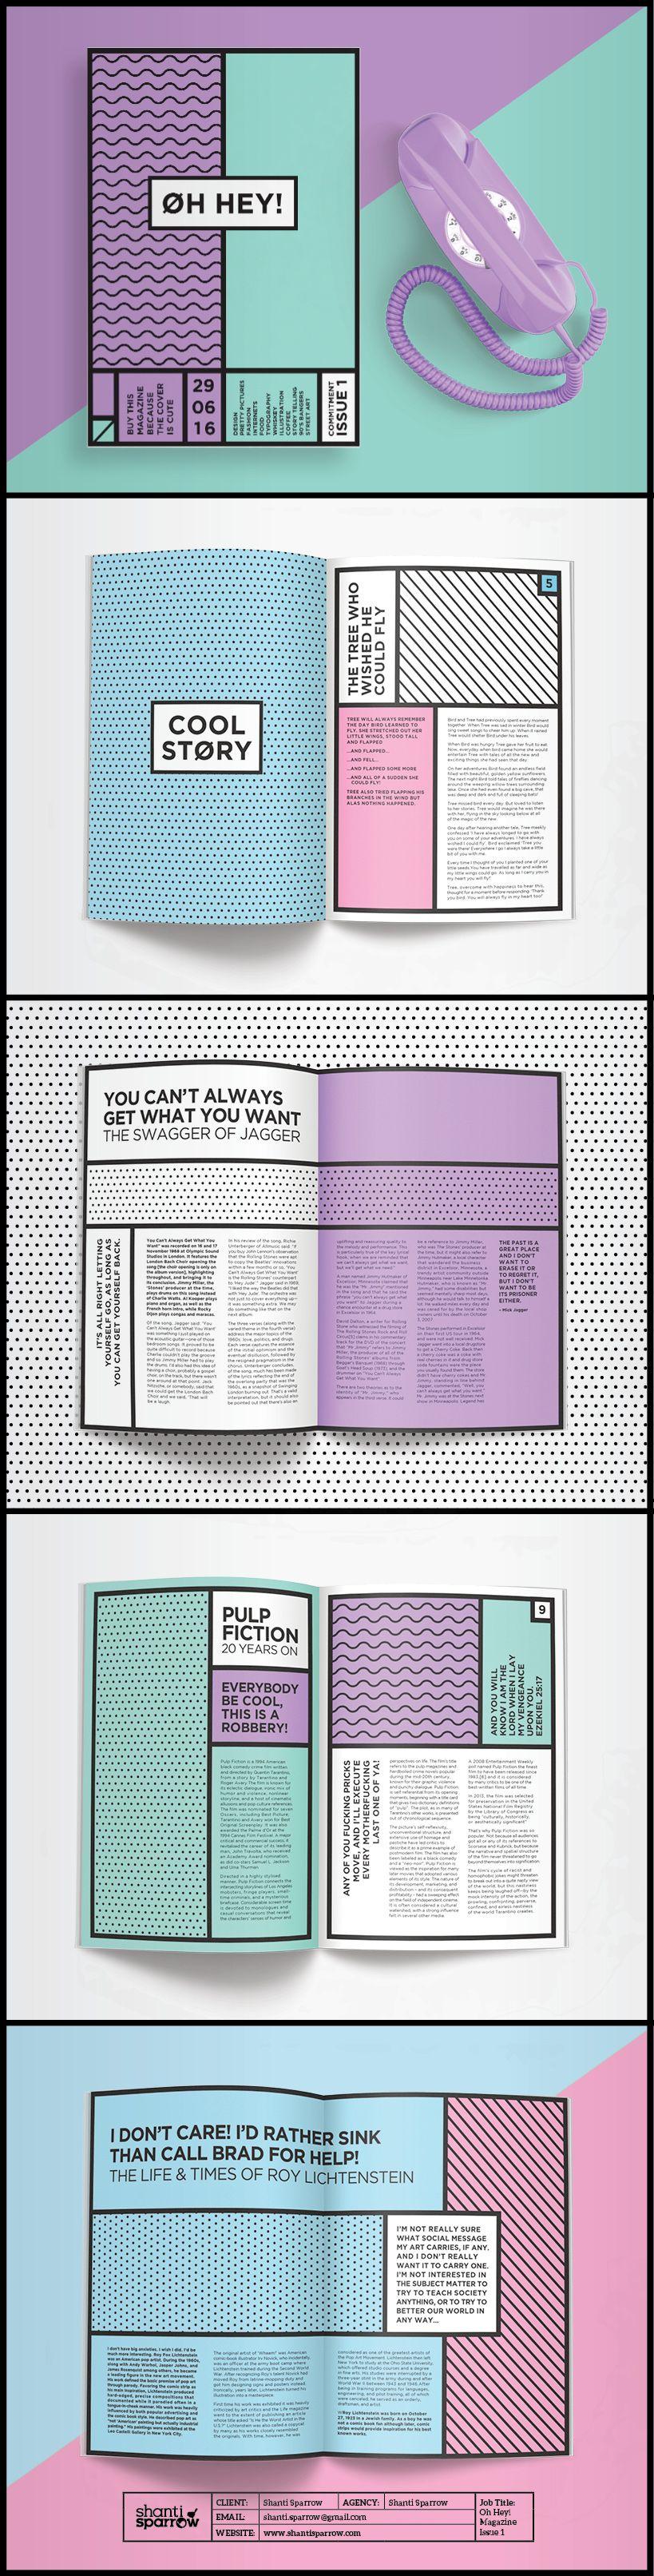 Design by Shanti Sparrow www.shantisparrow.com Client: Oh Hey! Project Name: Magazine Design